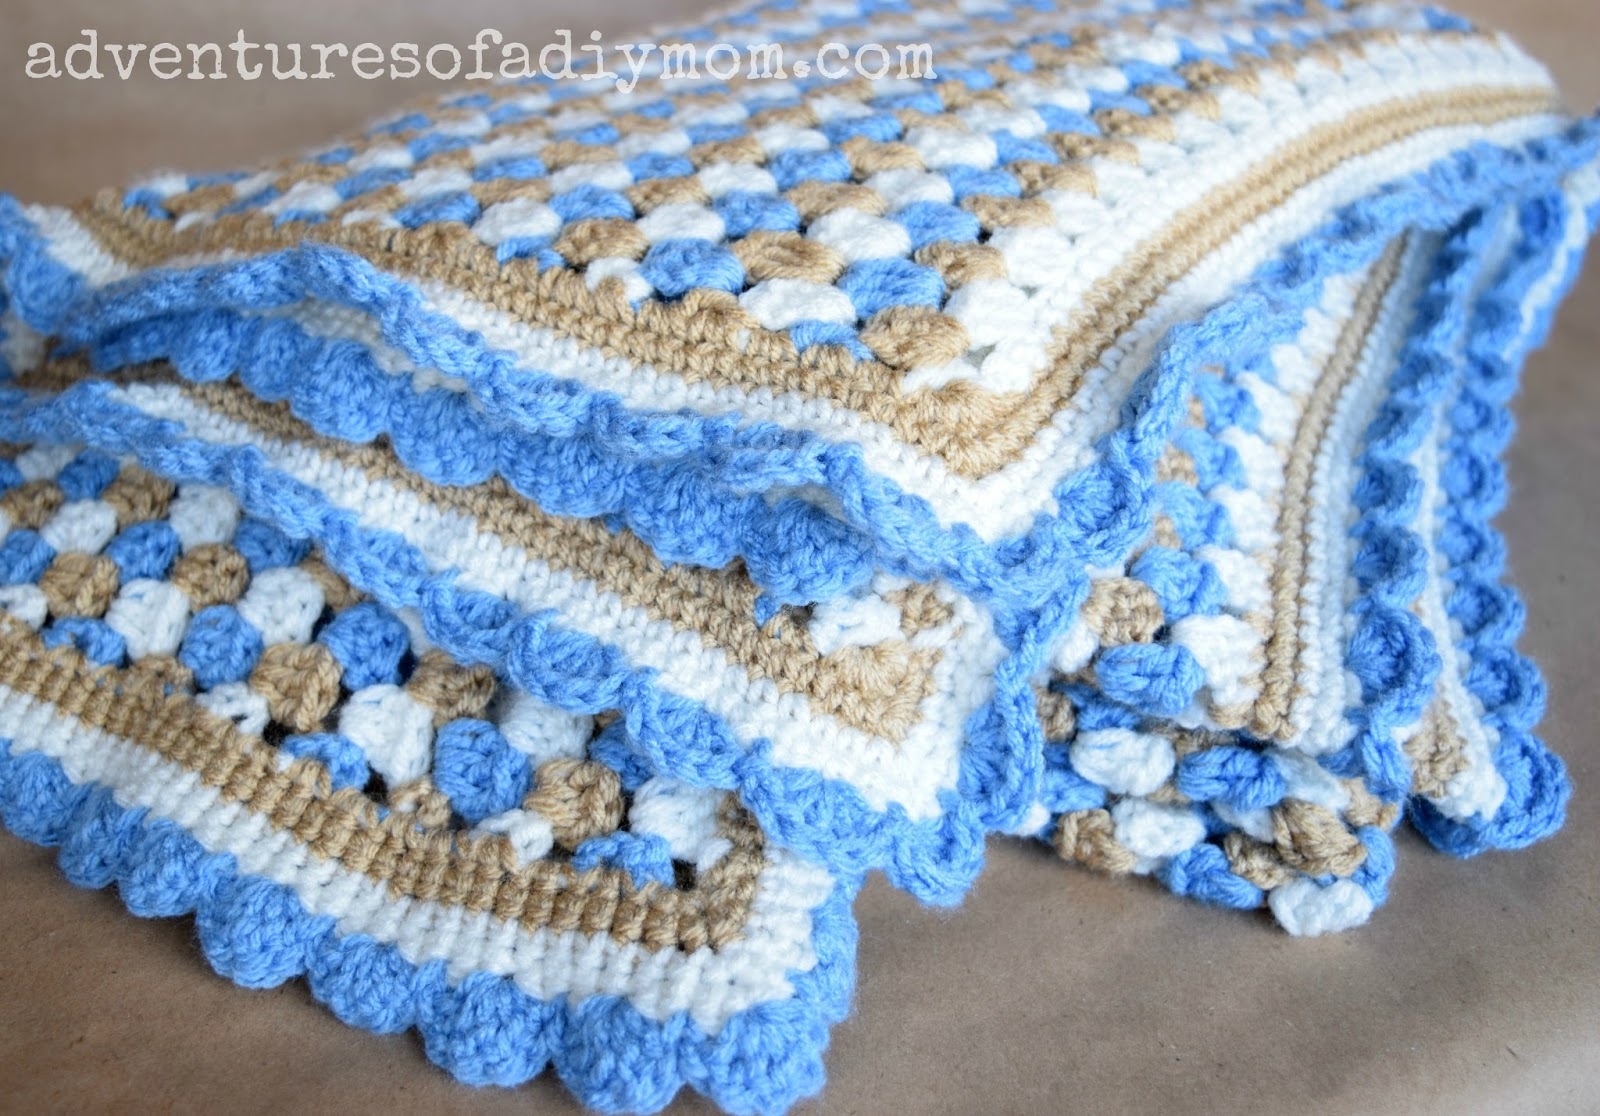 Crochet Granny Stripe Baby Blanket Pattern : Granny Stripe Crocheted Blanket - Adventures of a DIY Mom